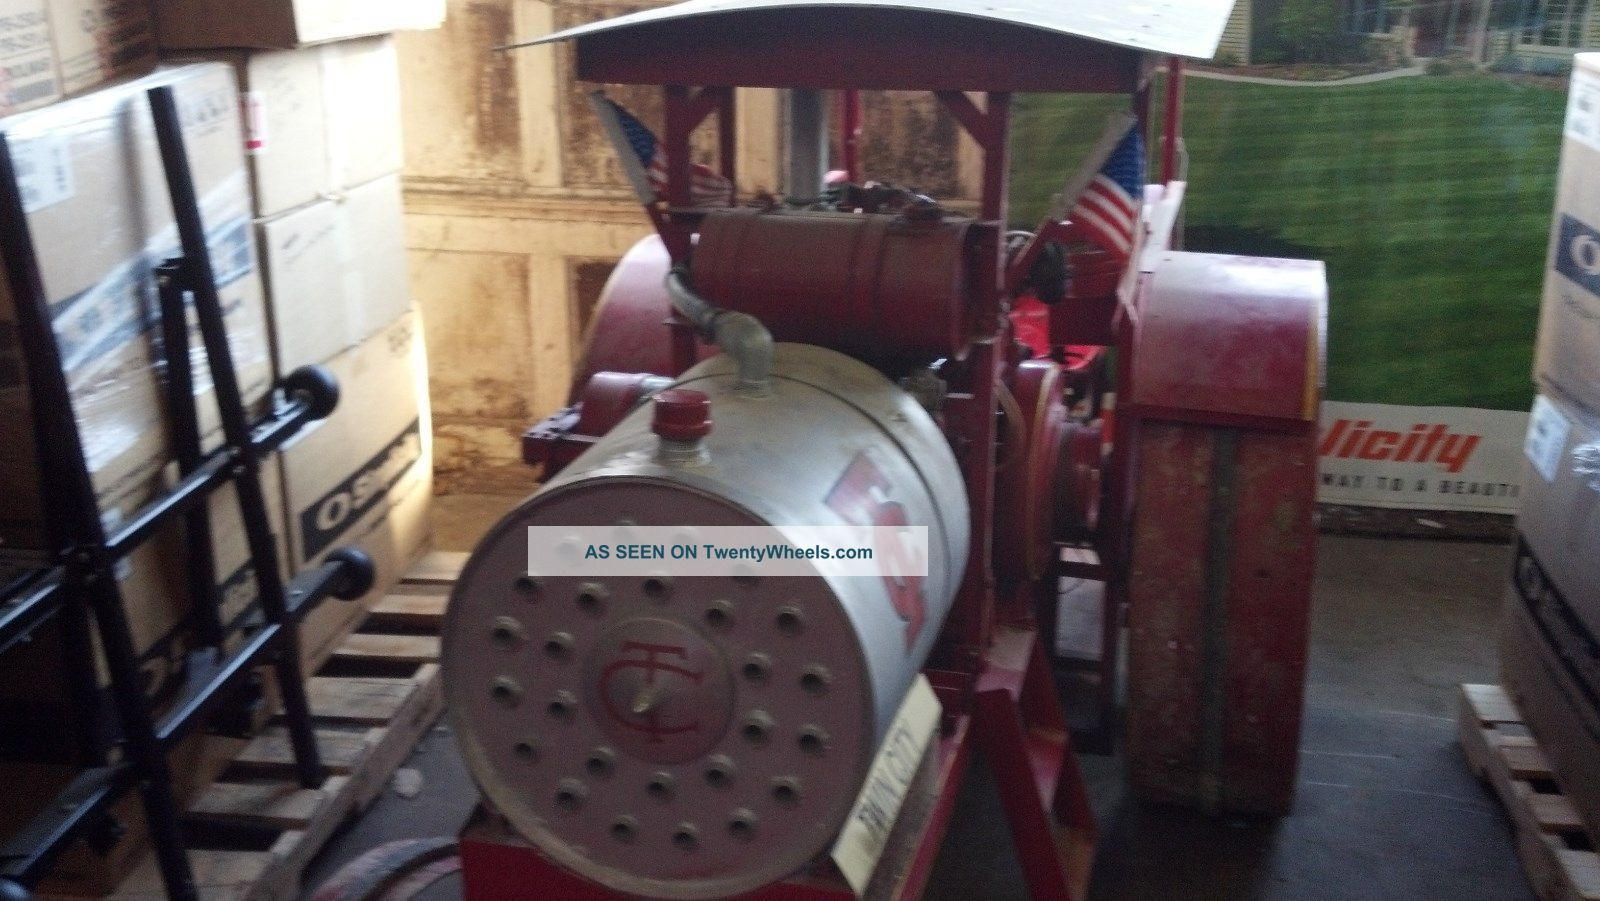 Twin City 40 - 65 Replica Tractor Antique & Vintage Farm Equip photo